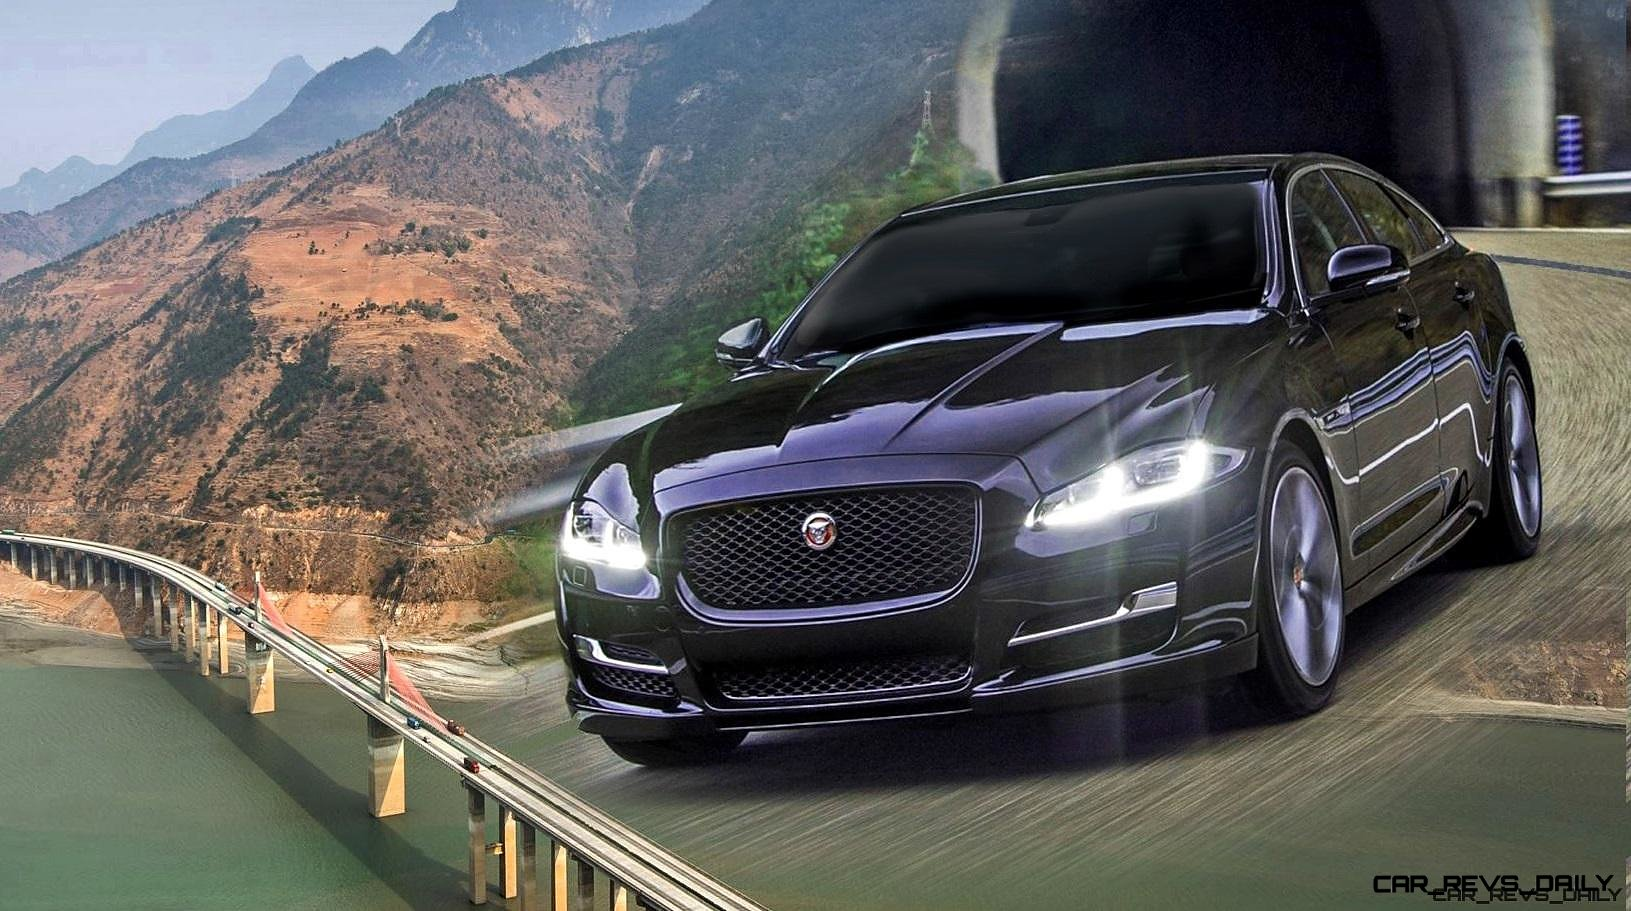 2016-Jaguar-XJ-Skyroad-Paxi-Expressway-China--28fsdc